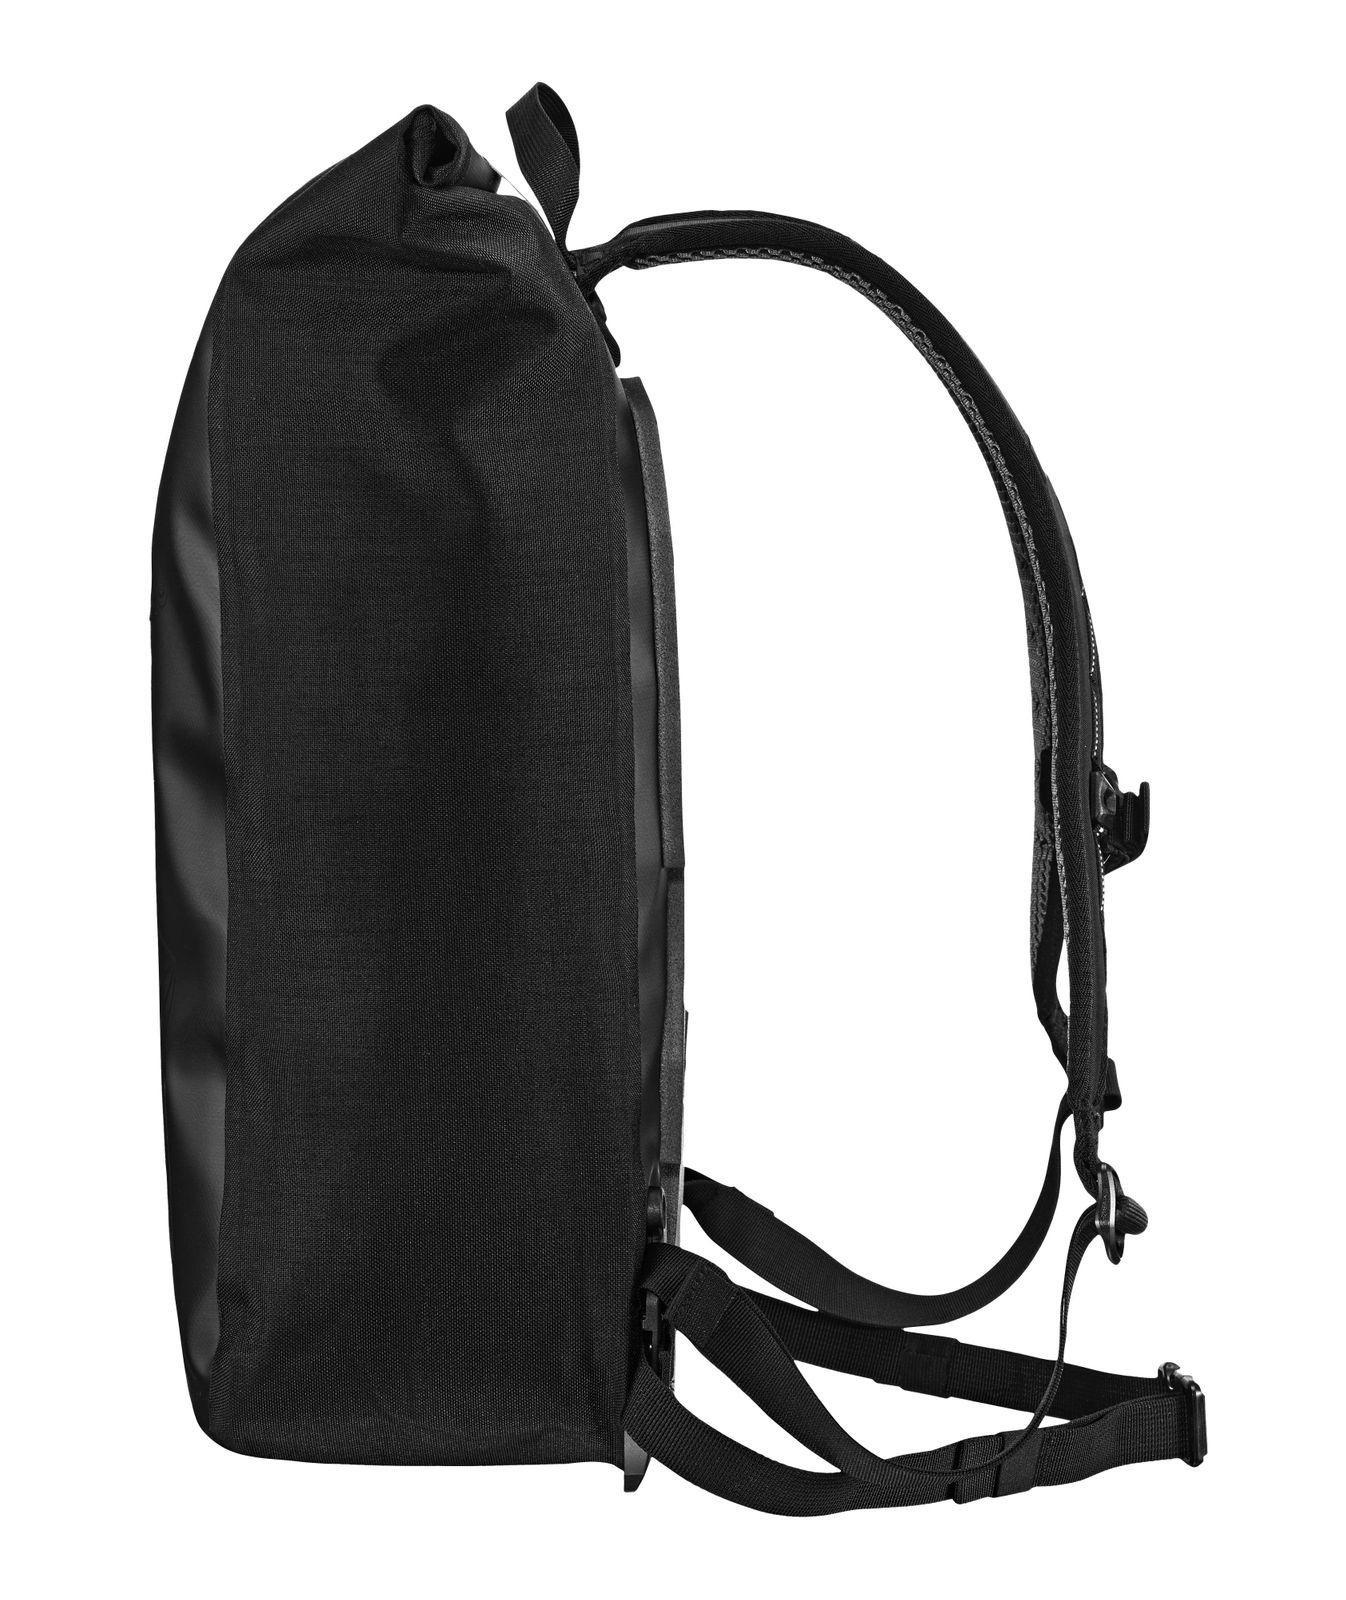 ORTLIEB Design Velocity City Backpack 23L Symmetry / Black Matt